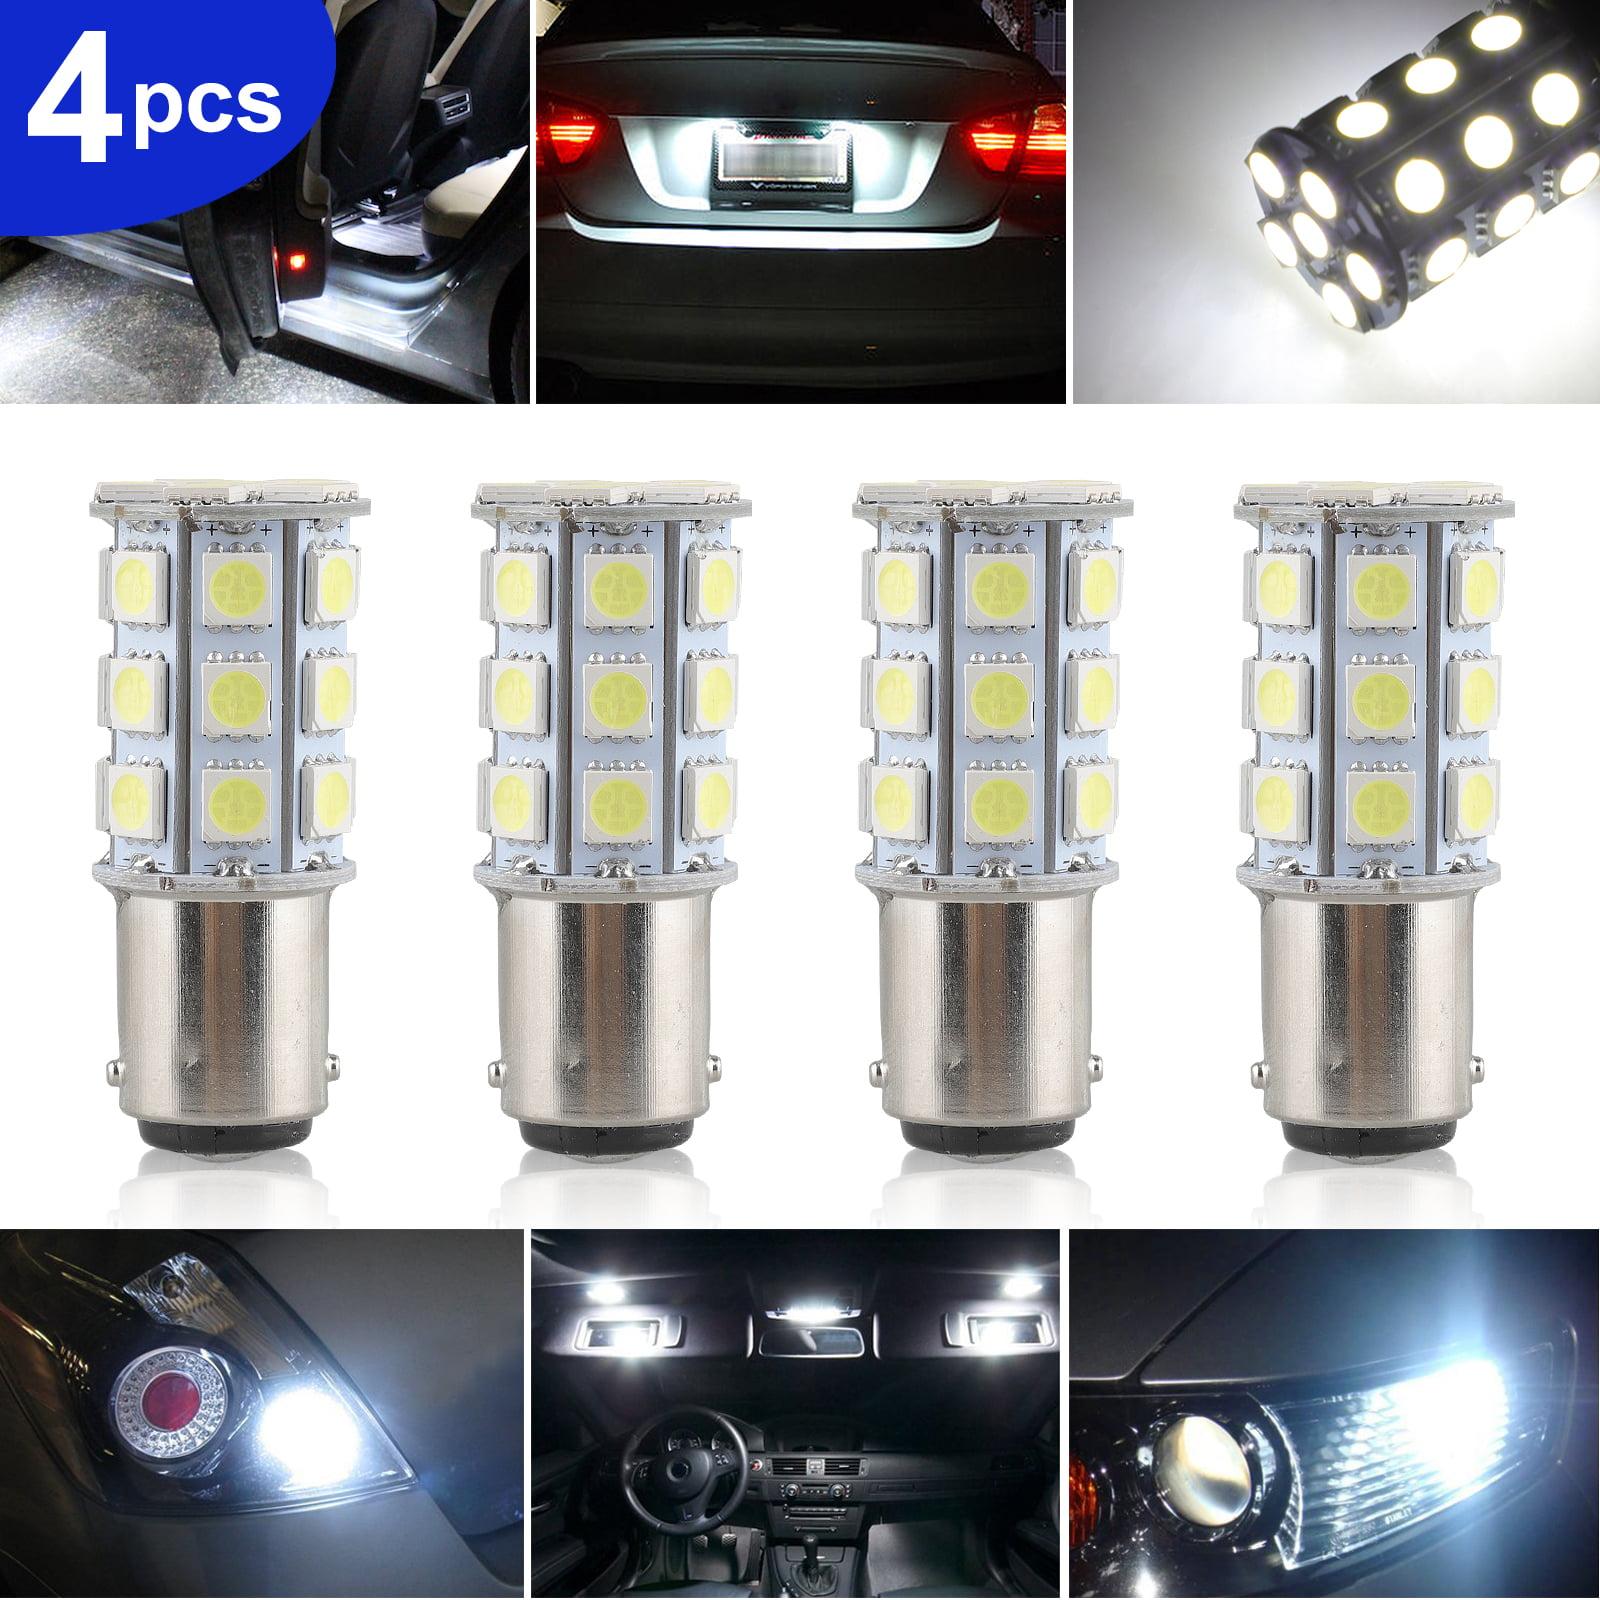 5 pcs White Mini Tiny SMD LED 5050 12V Strip Lights for Honda Motorcycle